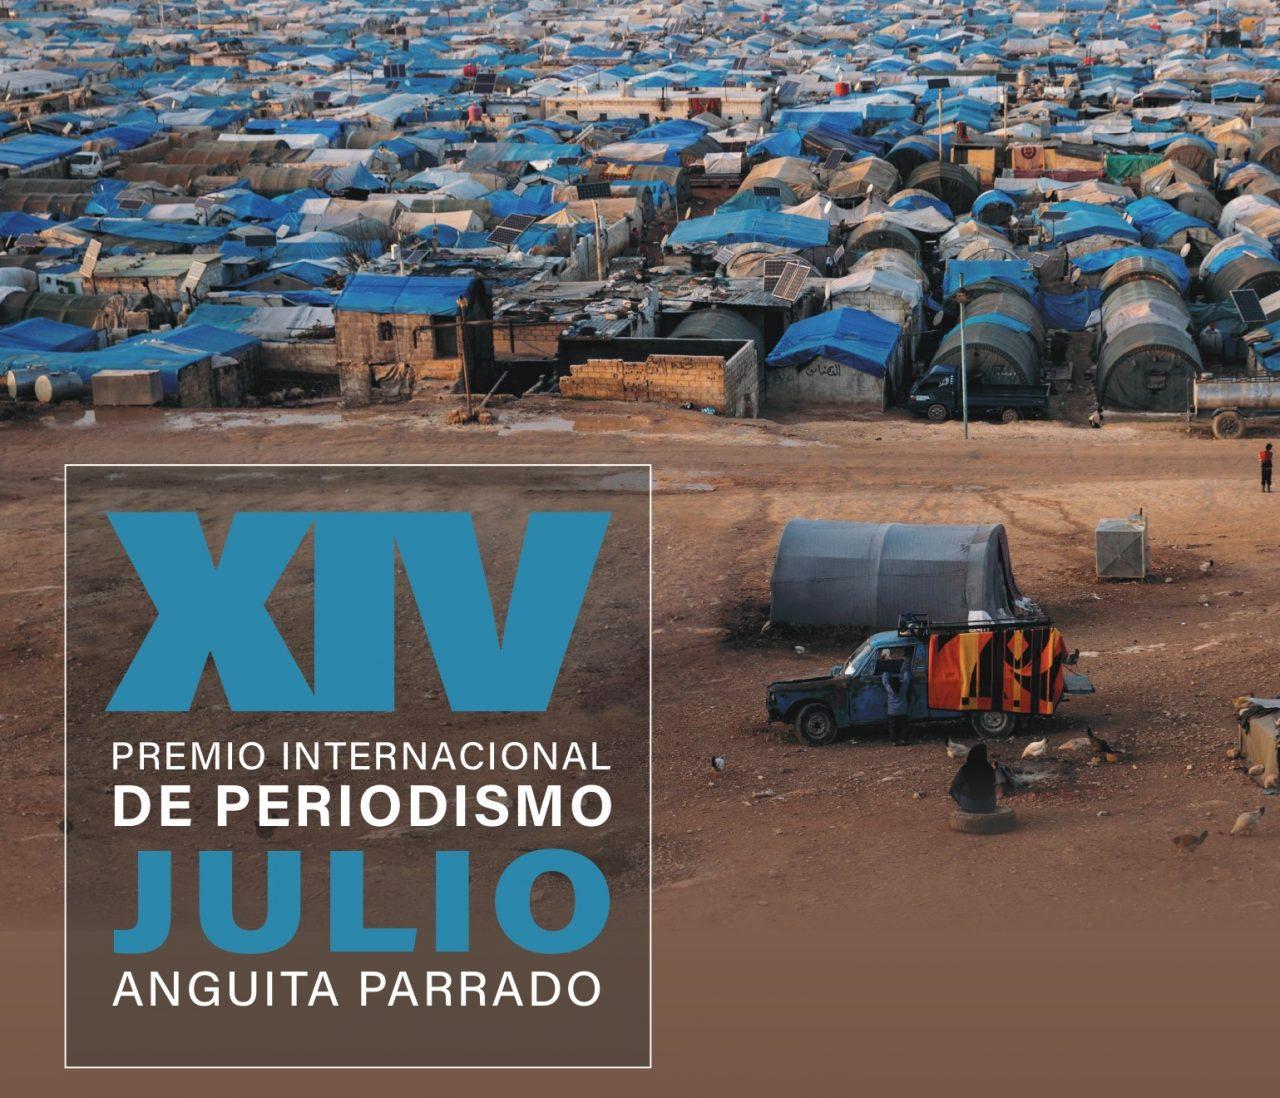 Anguita-Parrado-1280x1098.jpg